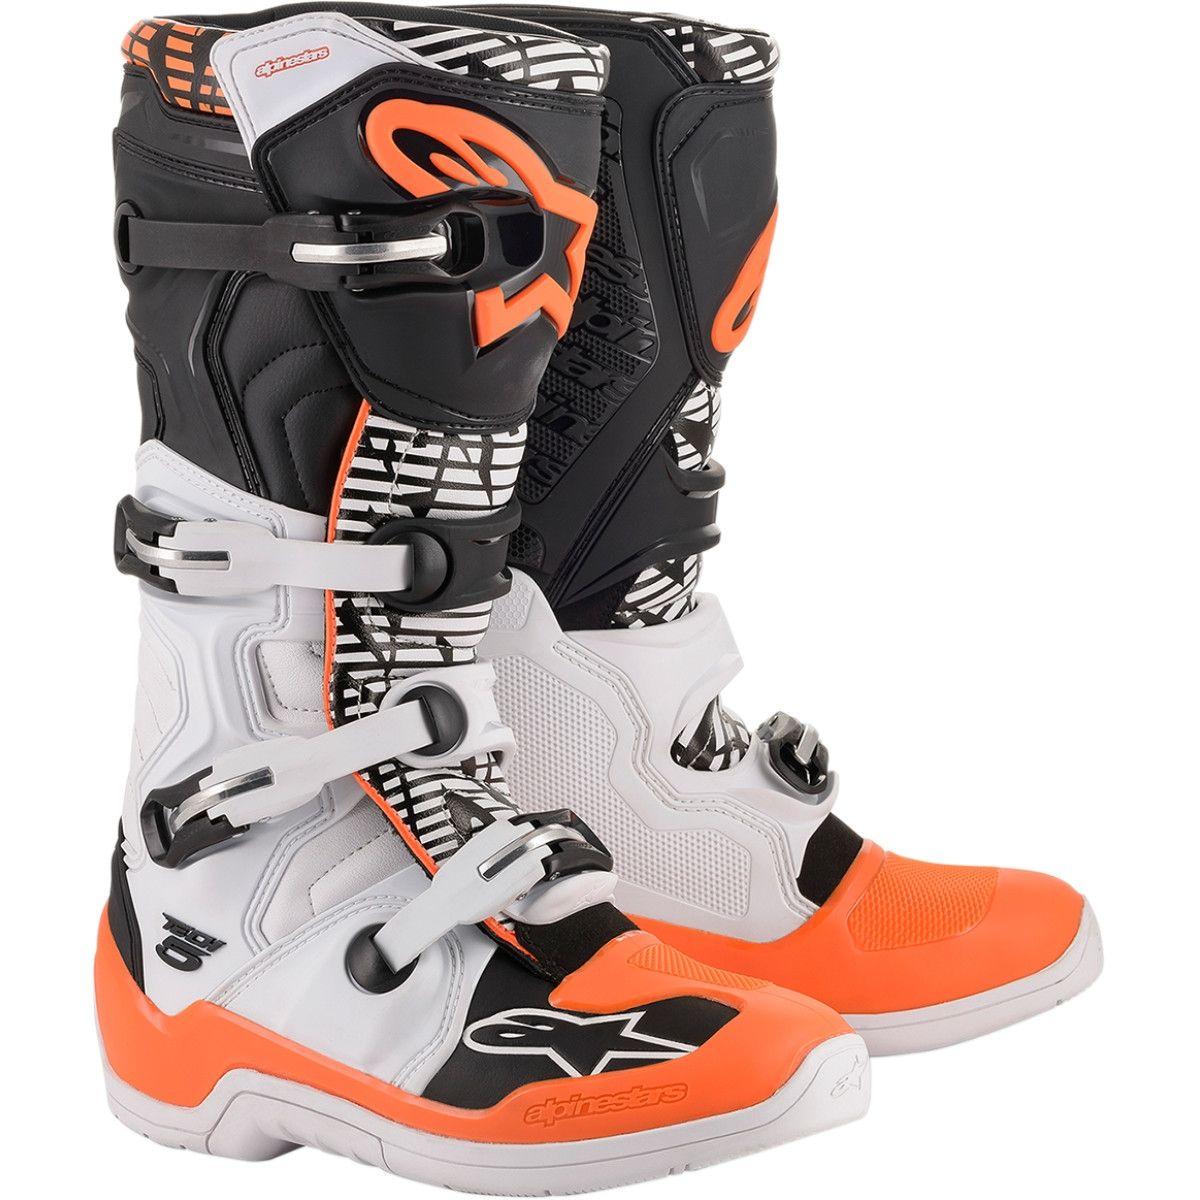 Alpinestars Crosslaarzen Tech 5 Orange/Black/White